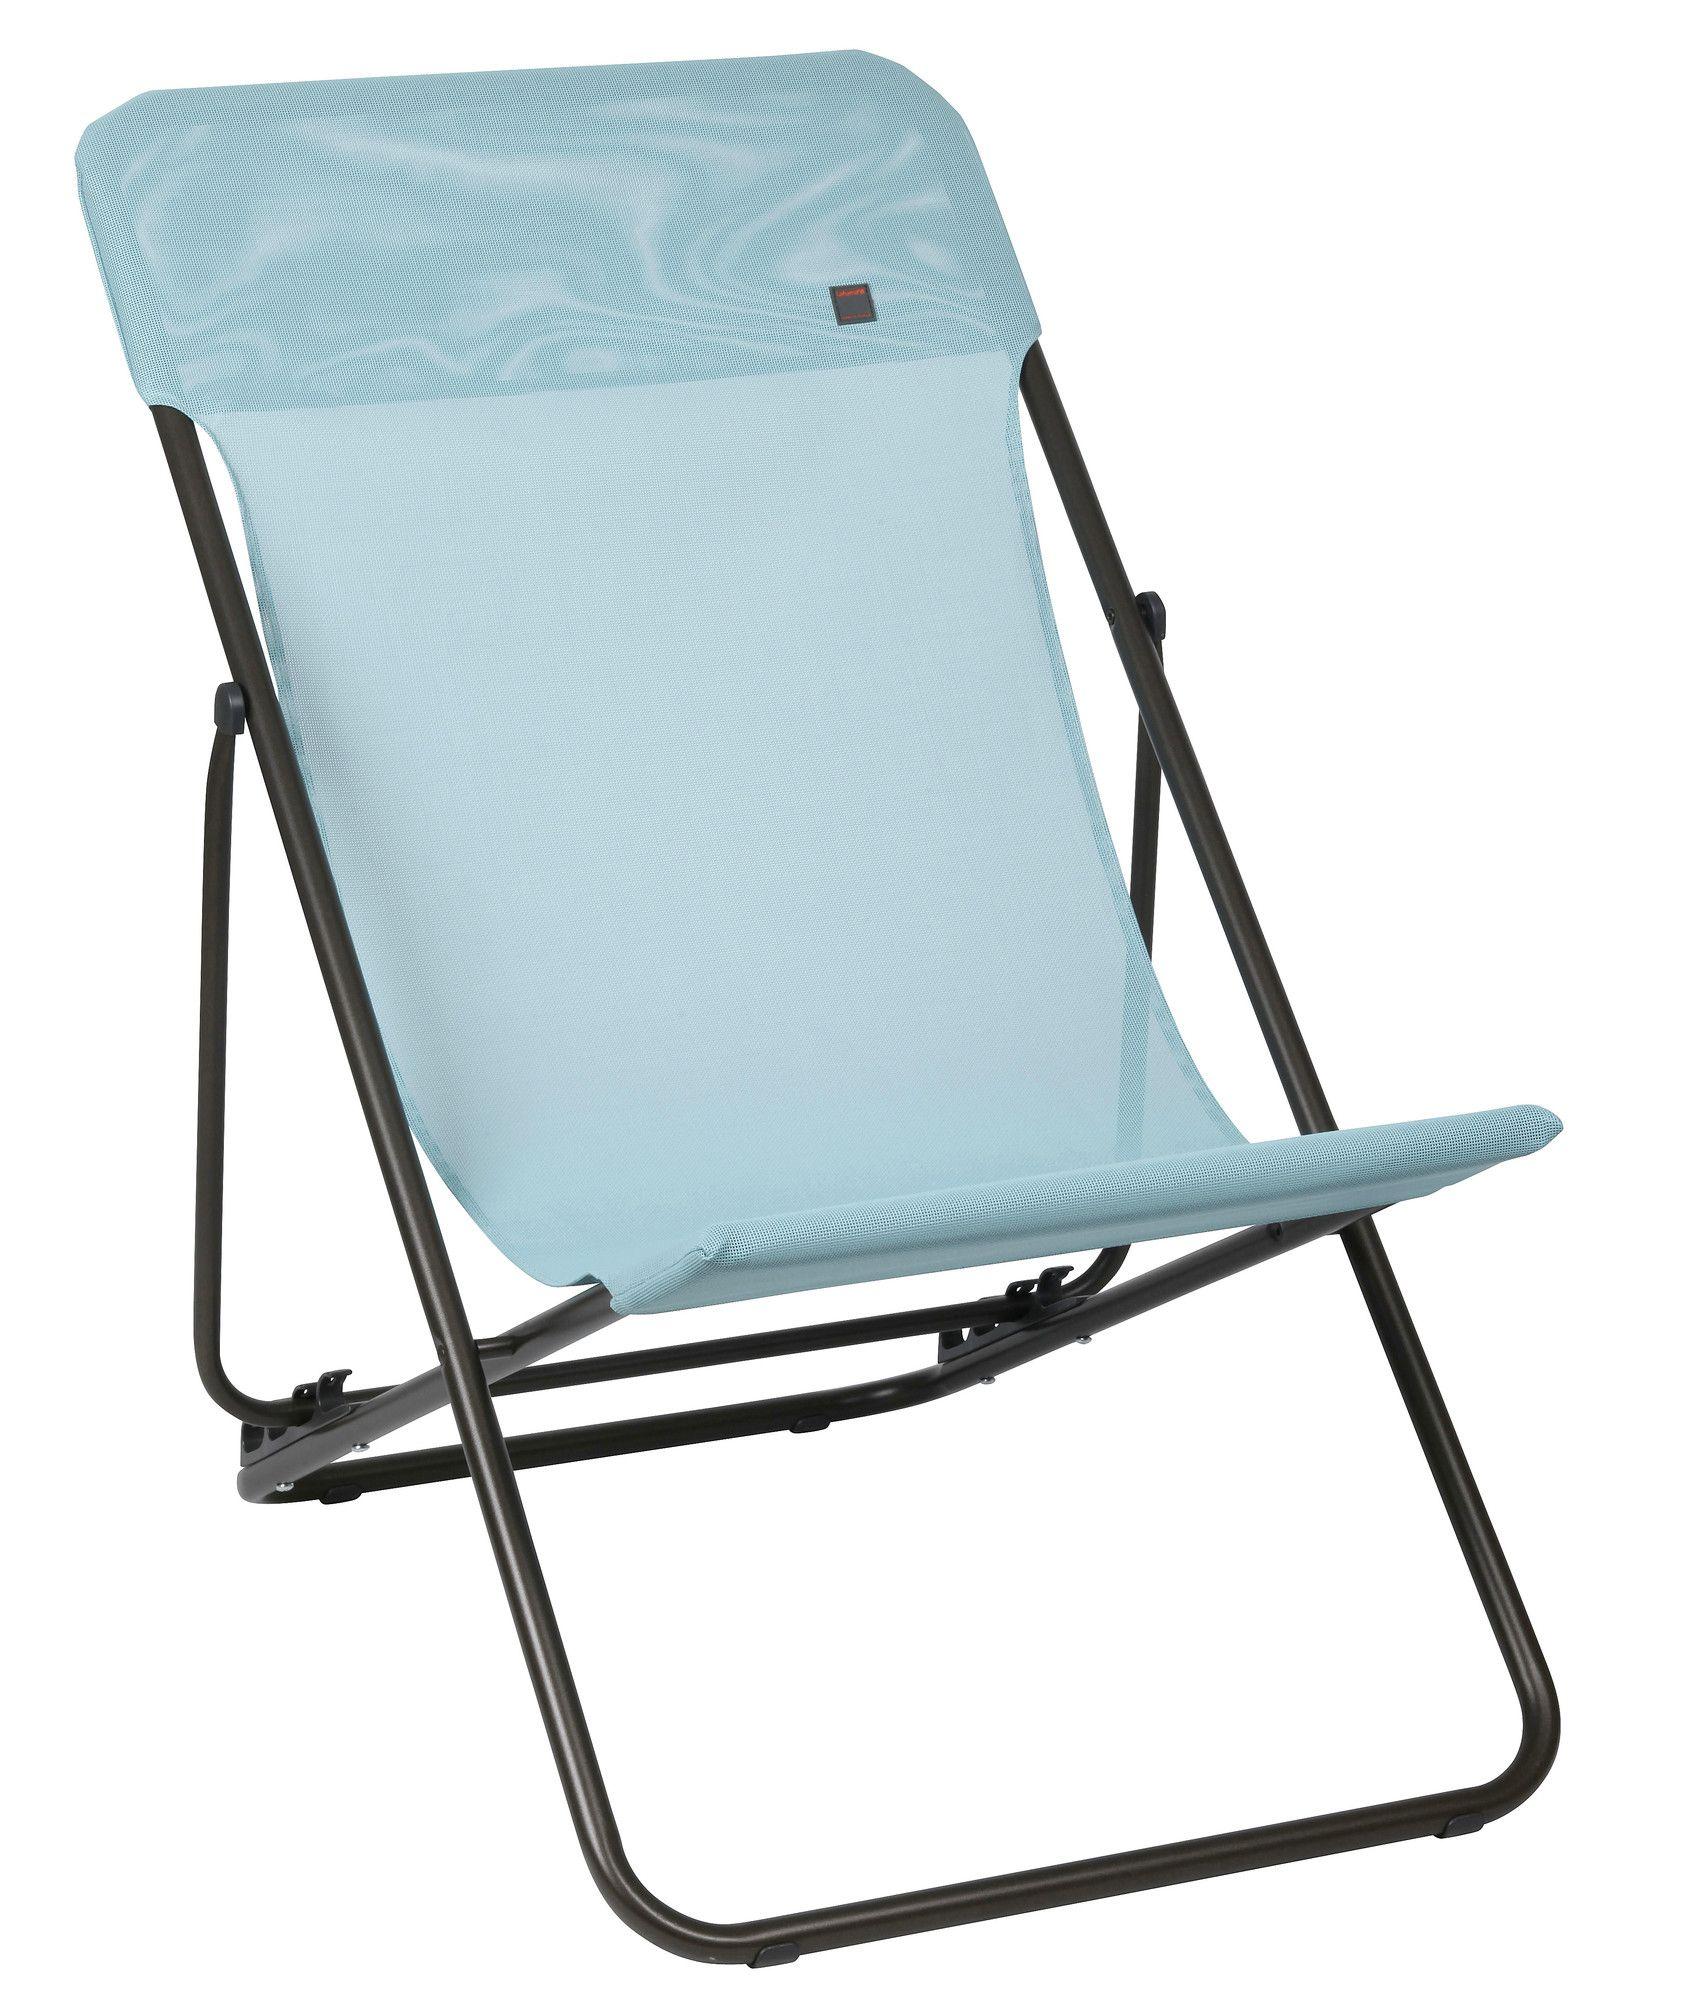 Malloy Patio Folding Chair | Steam Shower | Pinterest | Beach chairs ...